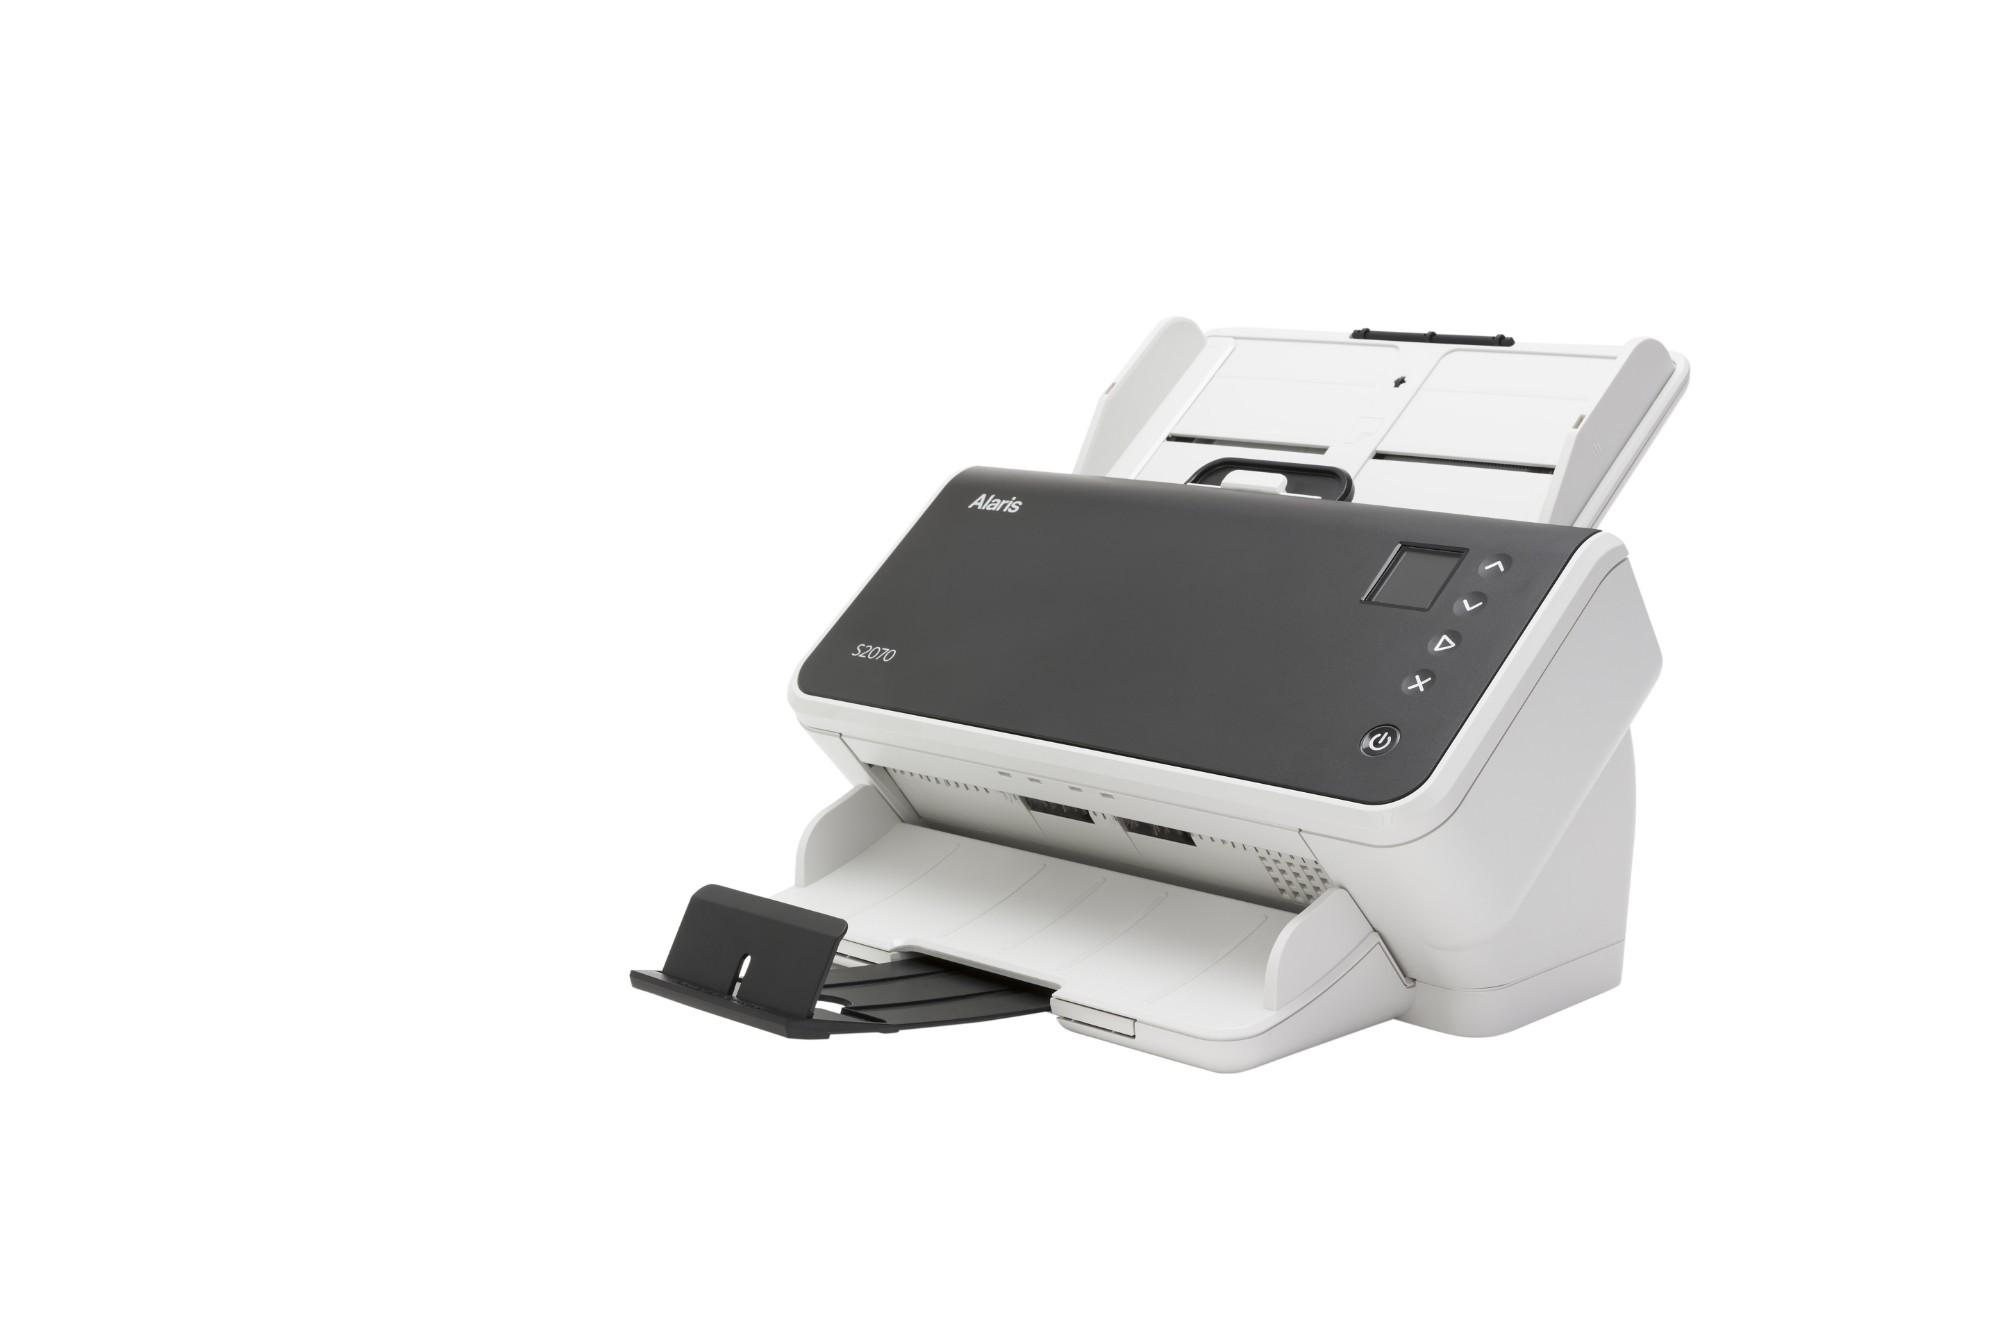 Kodak ALARIS S2070 Scanner ADF scanner 600 x 600DPI A3 Black, White